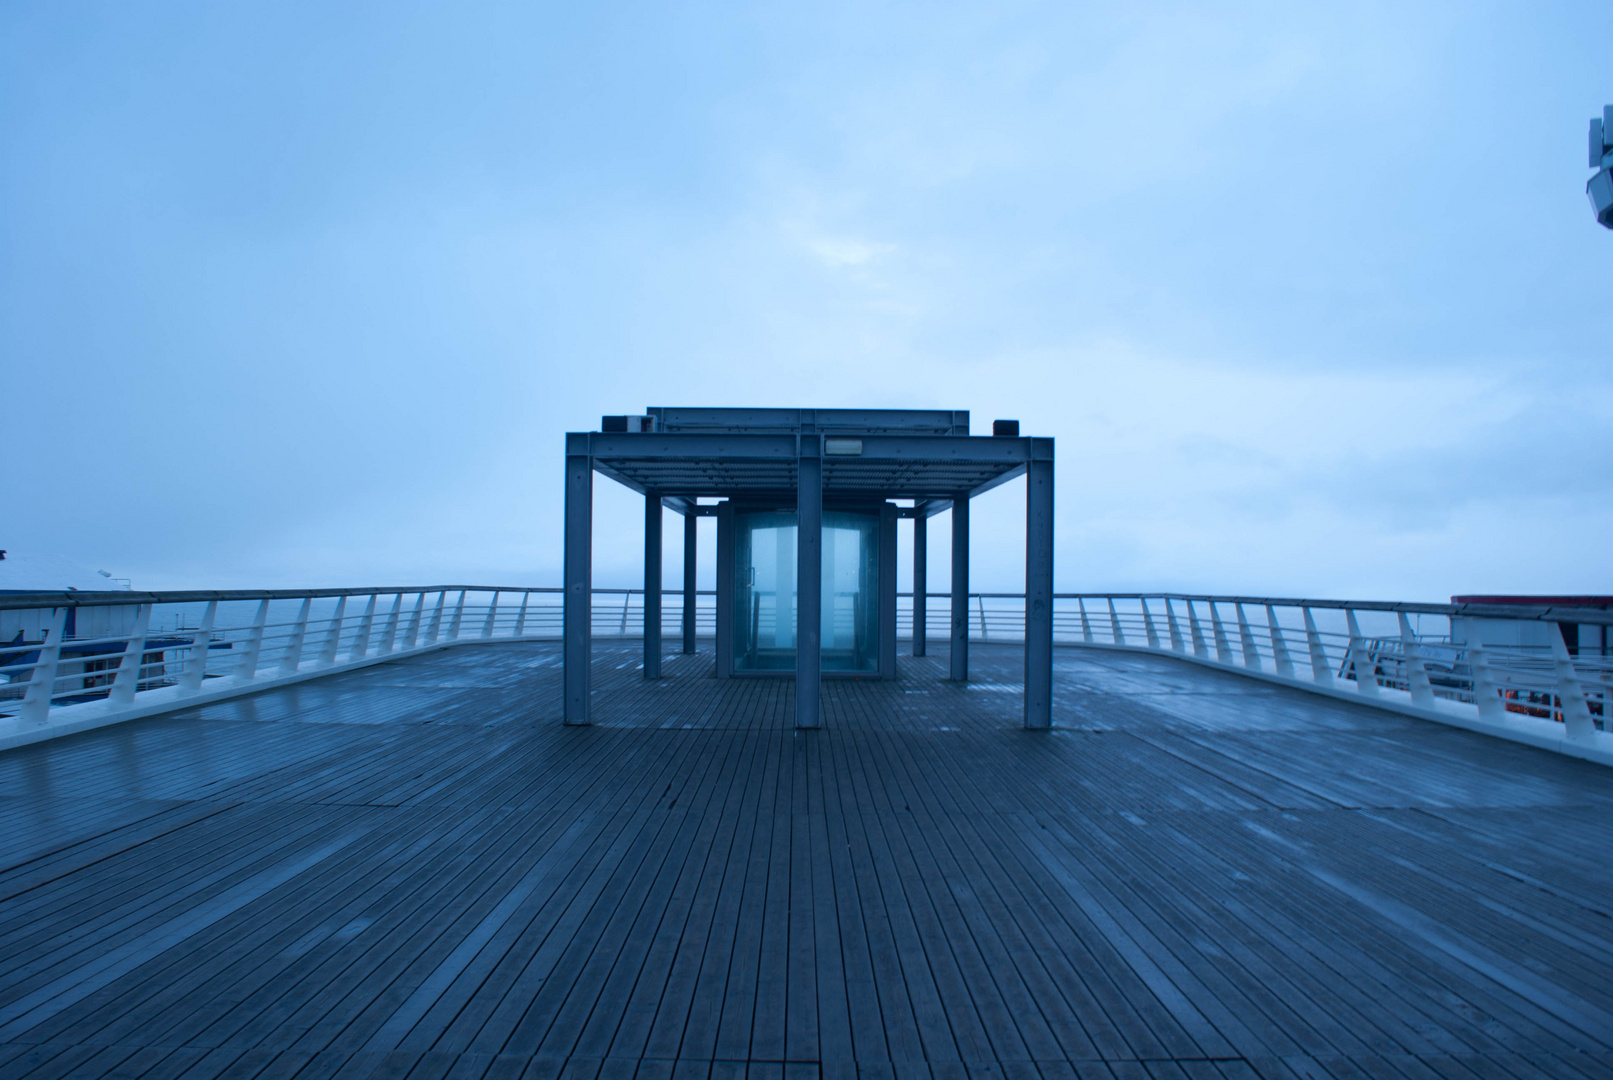 La porte cosmique de Scheveningen